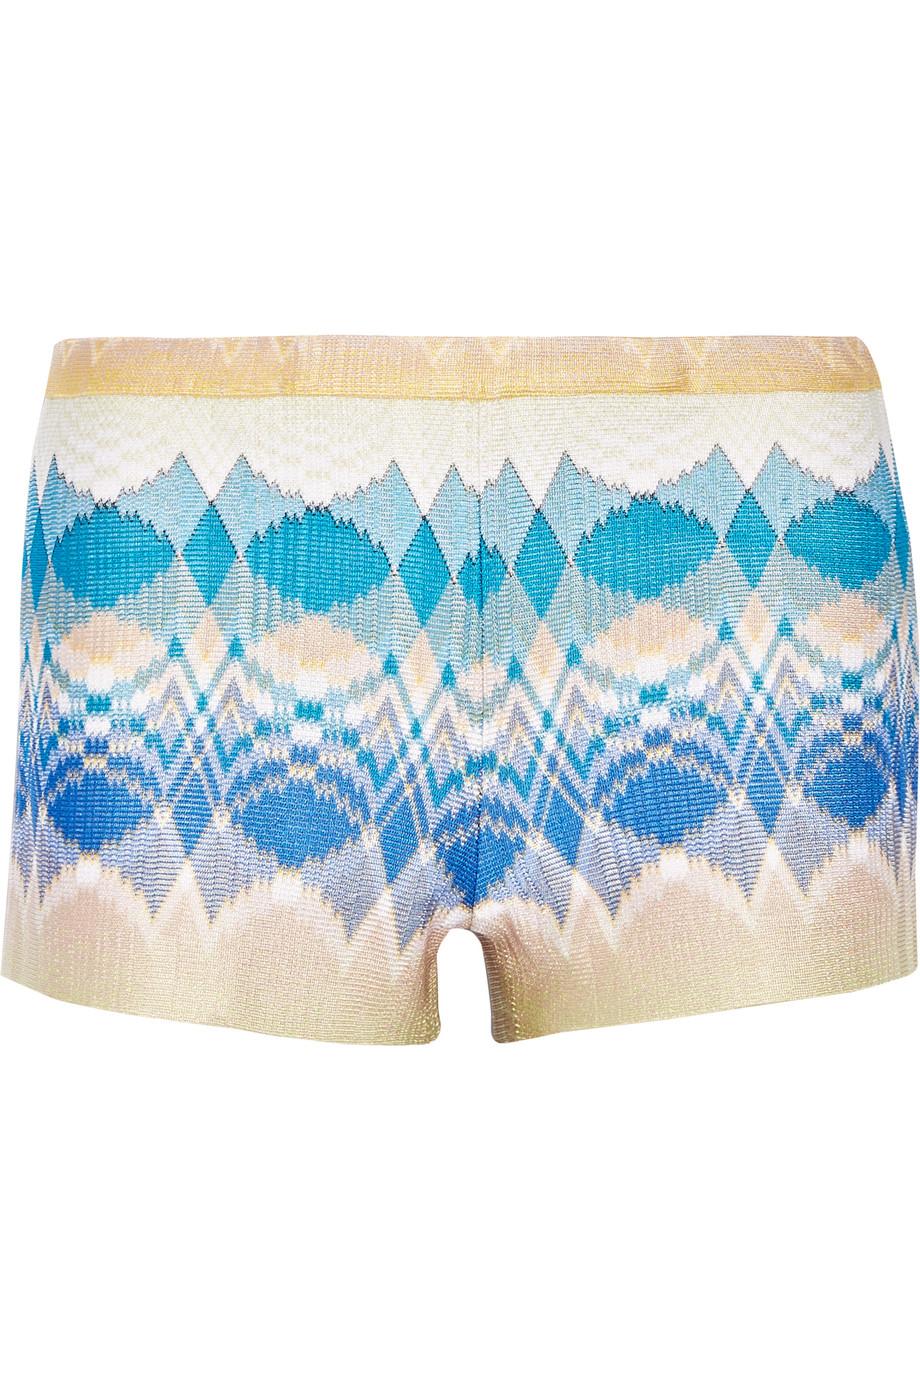 Missoni Metallic Crochet-Knit Shorts, Blue/Neutral, Women's, Size: 38